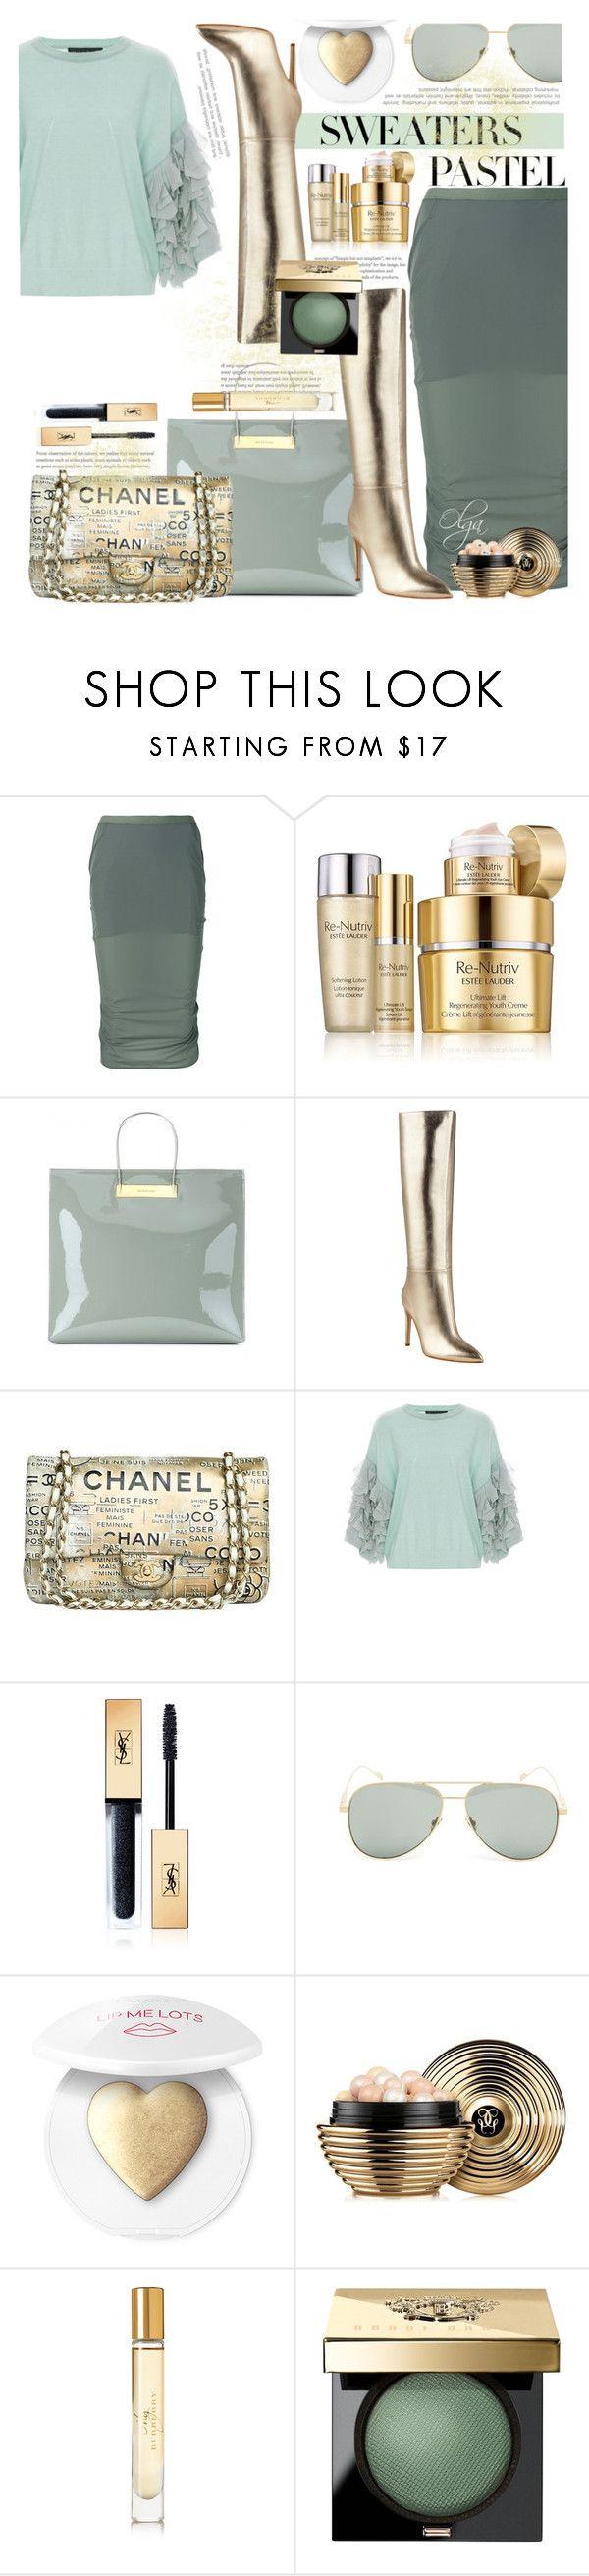 """Mint for Spring"" by olga1402 on Polyvore featuring Rick Owens, Estée Lauder, Balenciaga, GUESS, Chanel, Tabula Rasa, Yves Saint Laurent, Guerlain, Burberry and Bobbi Brown Cosmetics"